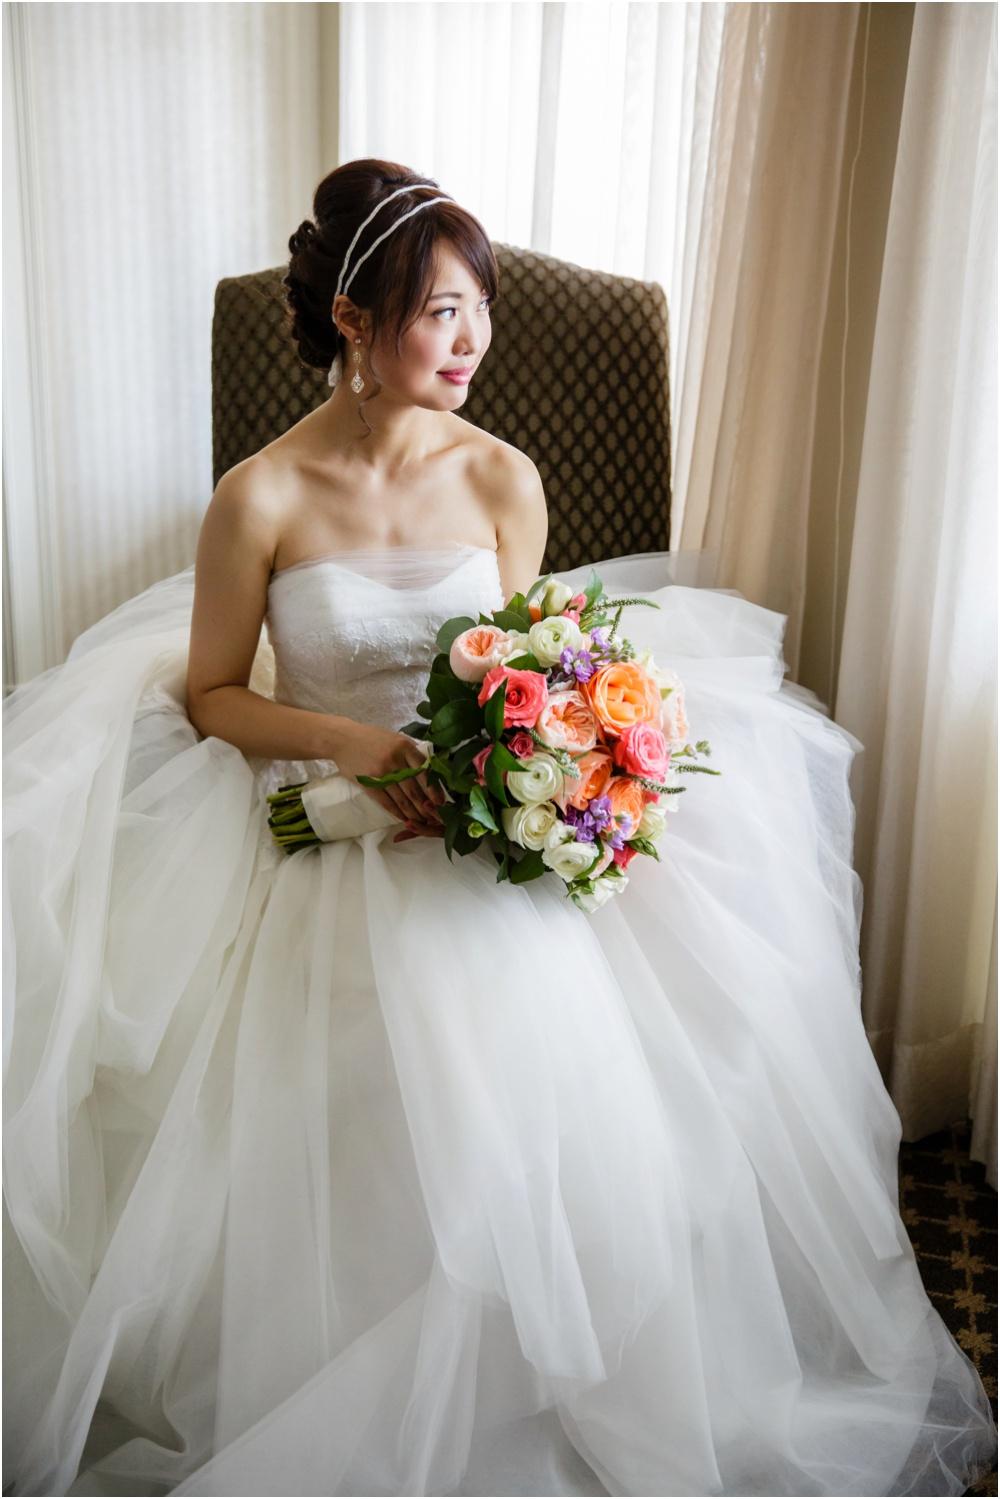 RI-Wedding-Photographer-Lefebvre-Photo-Blog_3174.jpg